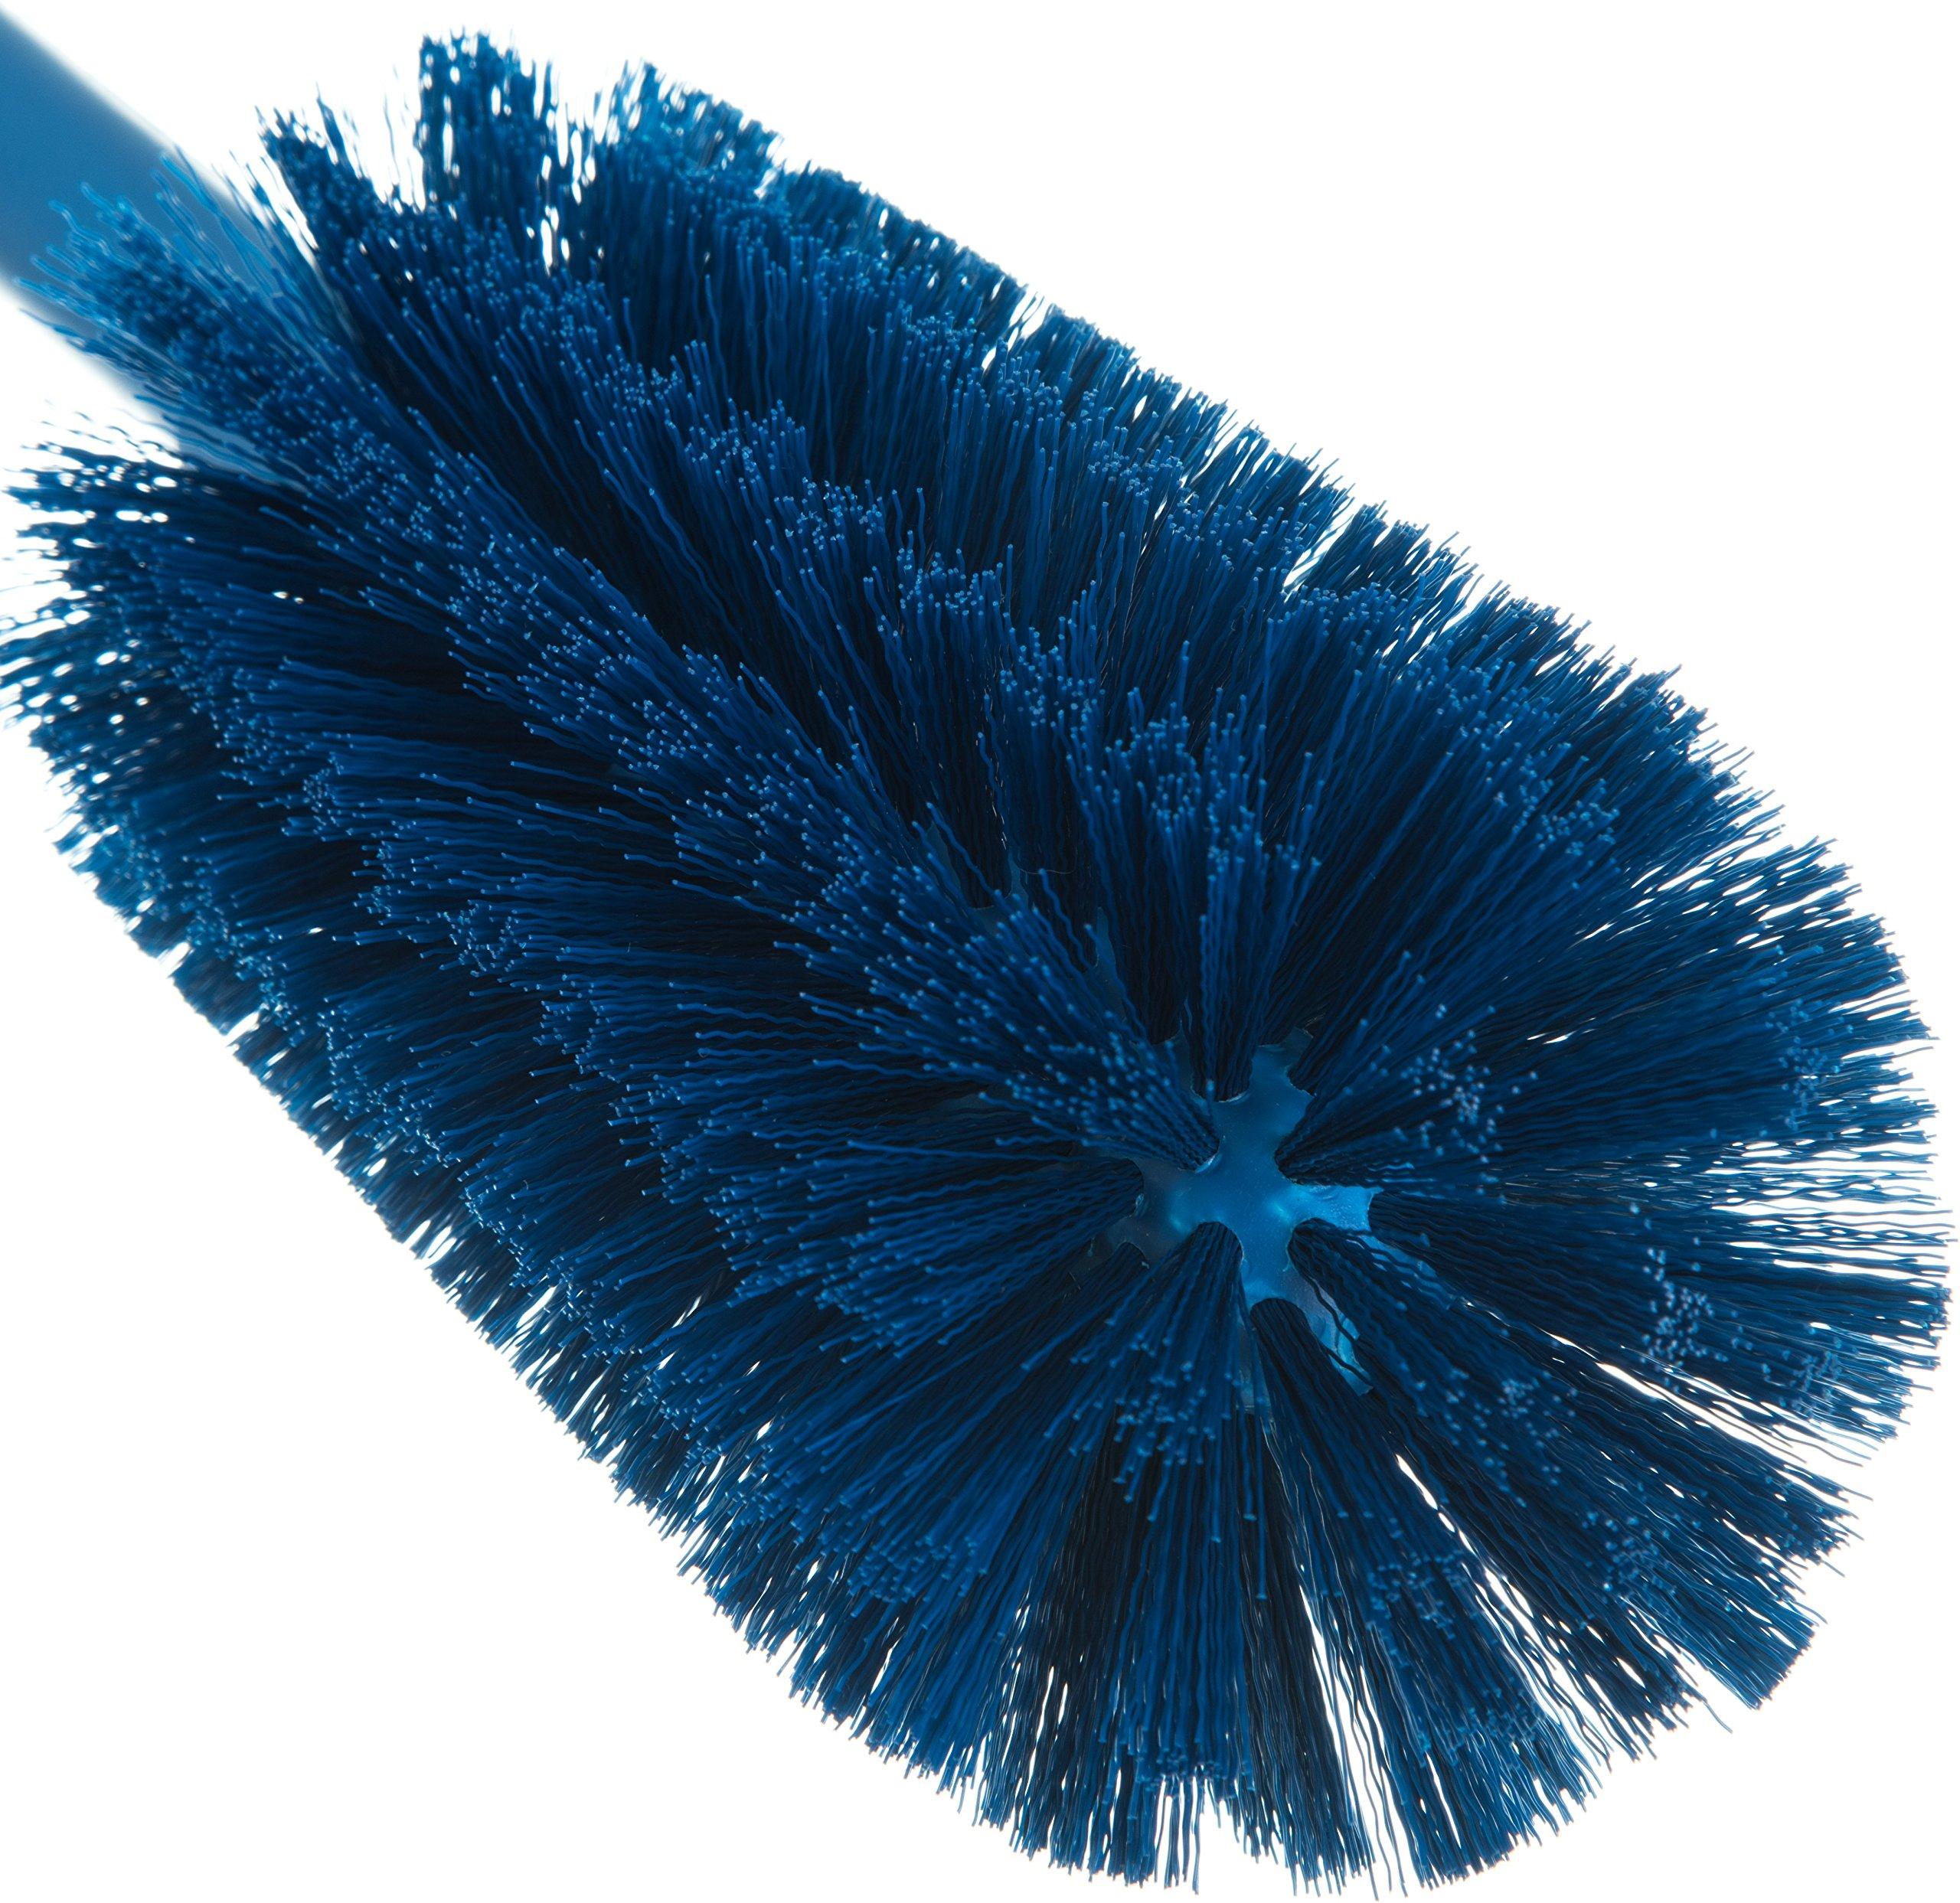 Carlisle 40001C14 Commercial Bottle Brush, Polyester Bristles, 16'' Length, Blue (Pack of 6) by Carlisle (Image #4)